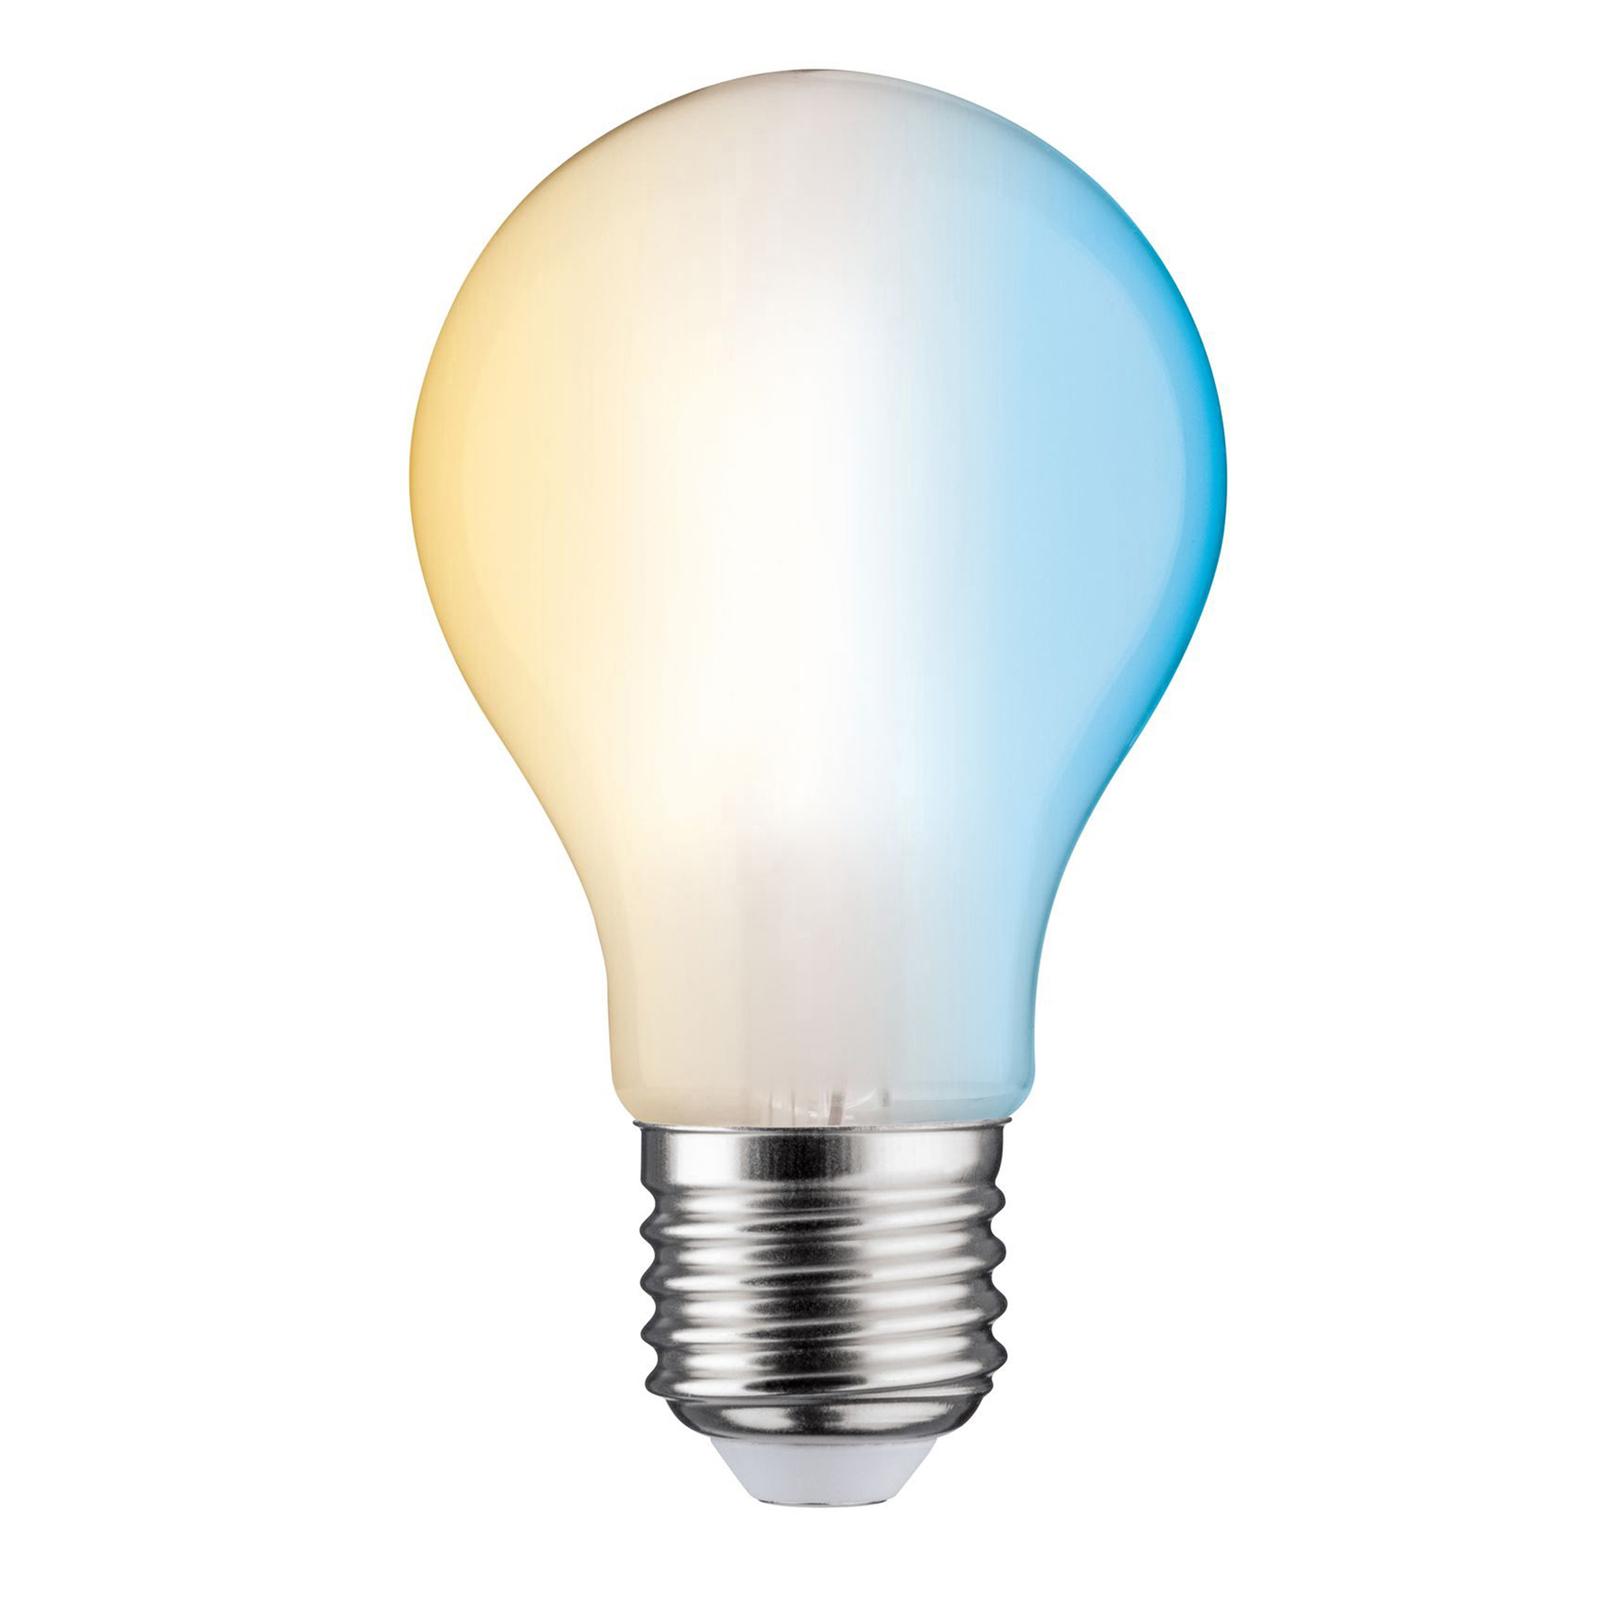 Paulmann ampoule LED E27 4,7W ZigBee Tunable White